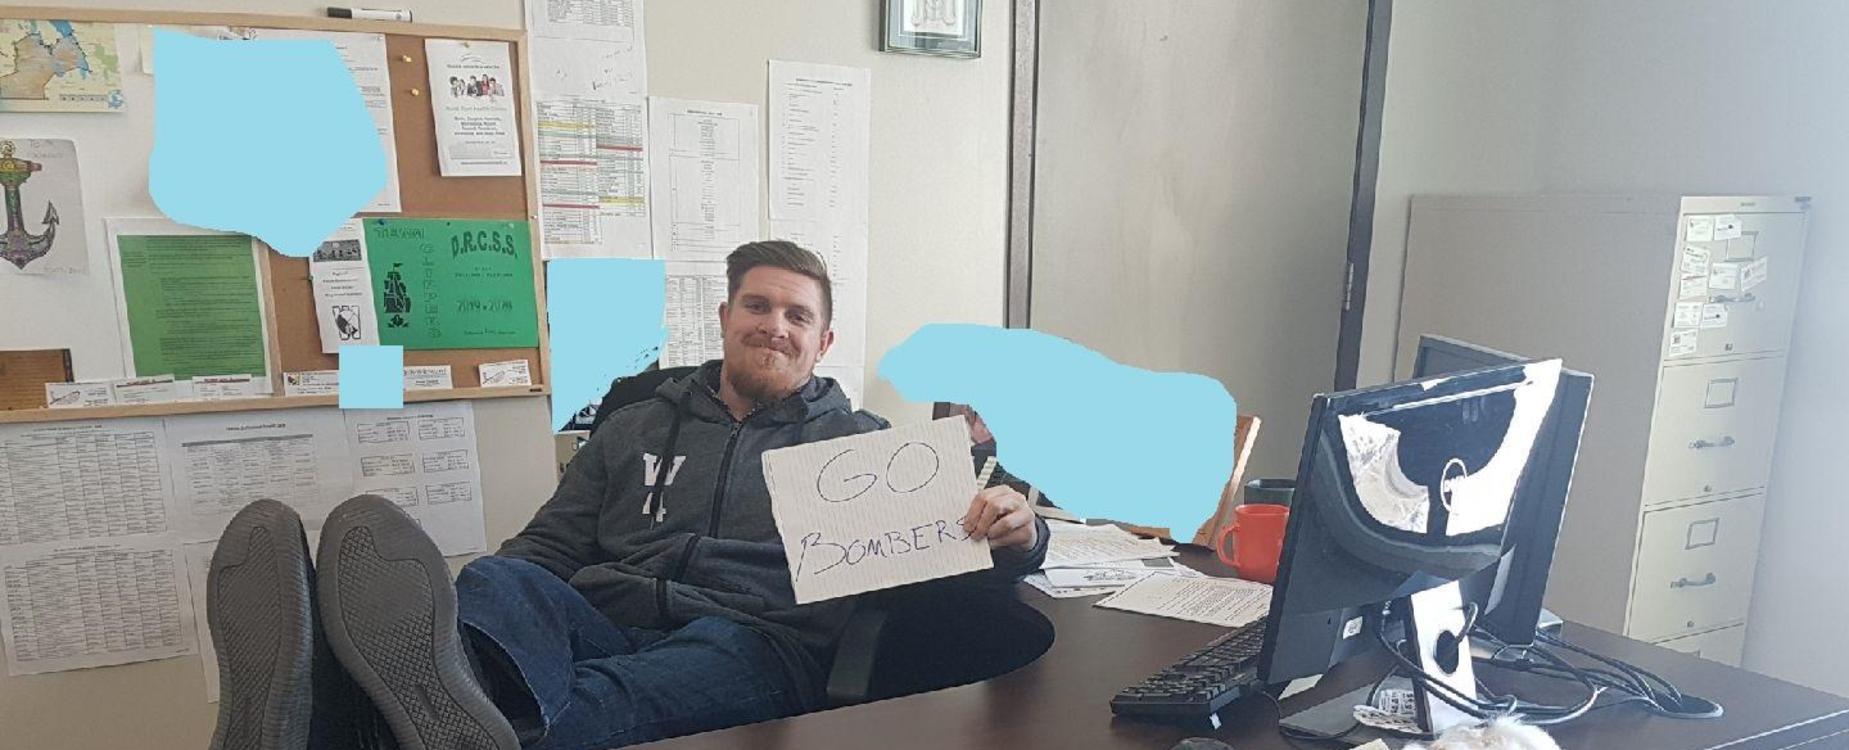 Adam Bighill of the Winnipeg Blue Bombers